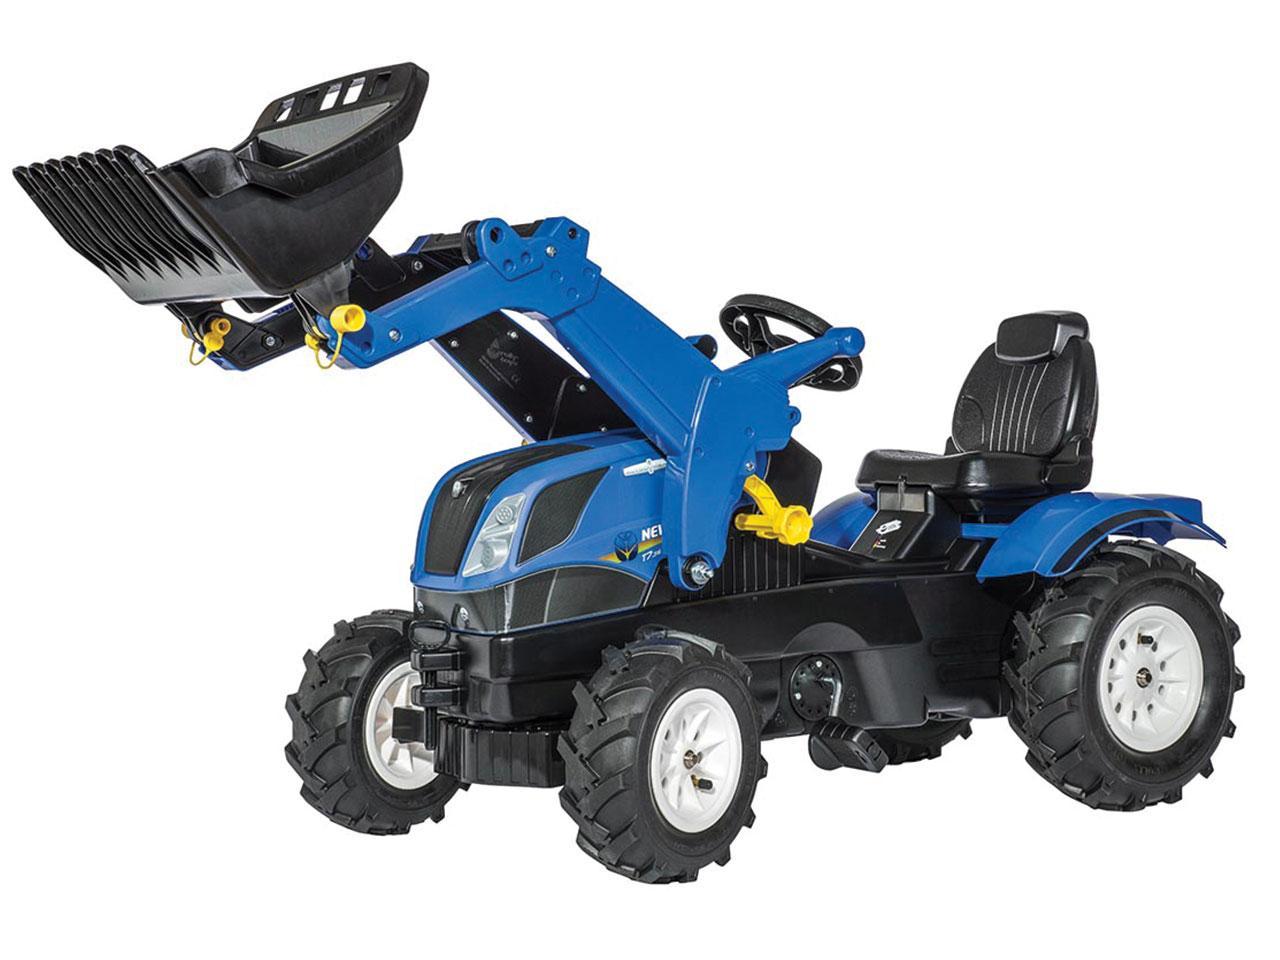 Šlapací traktor ROLLY TOYS Farmtrac New Holland s čelním nakladačem a pneumatikami